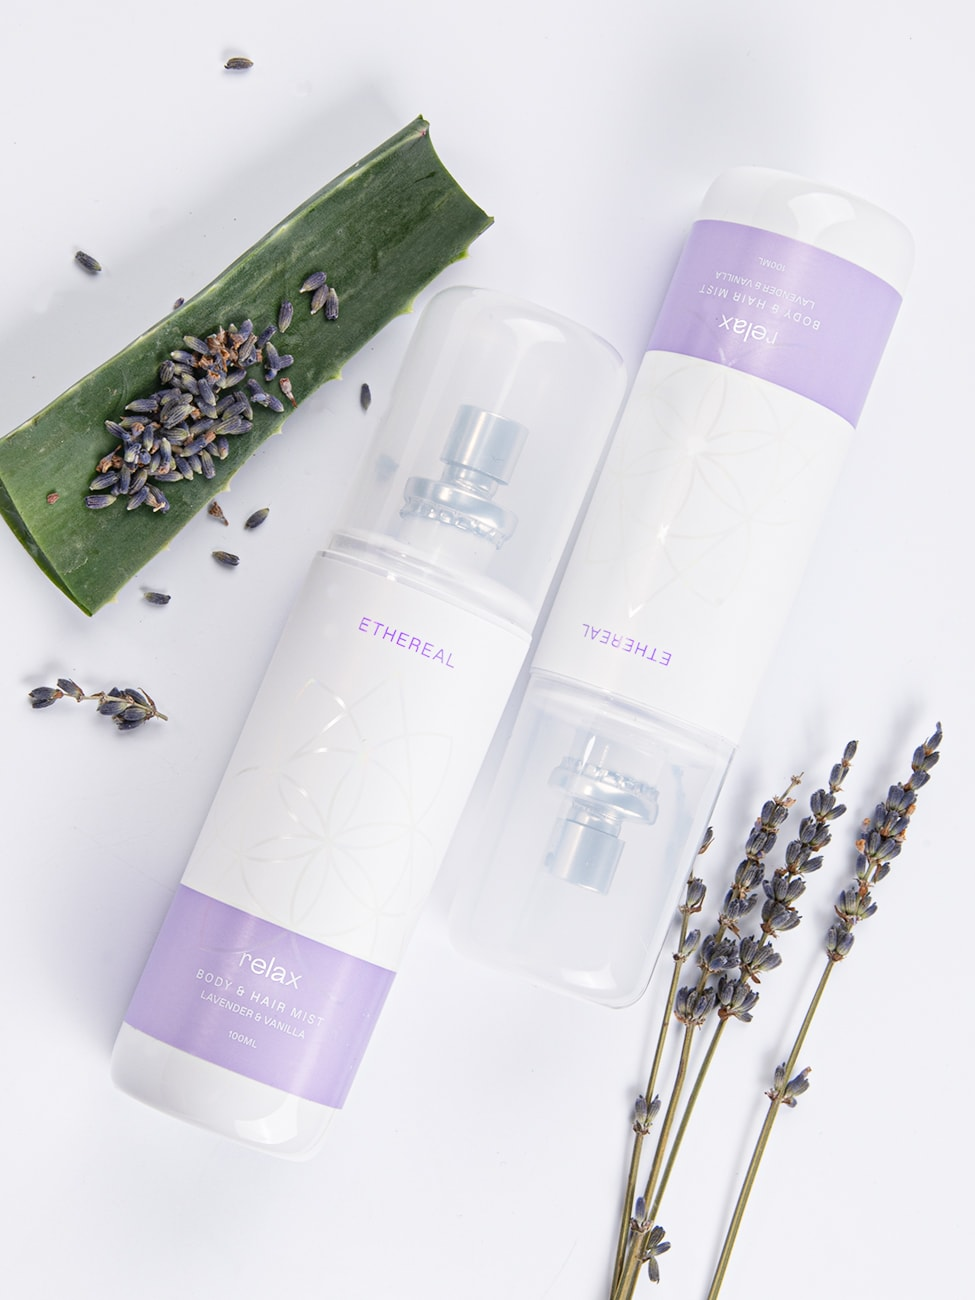 Relax_mist_comp_Ethereal_Dermocosmetics_Skincare_Handmade_Greek_Products_2